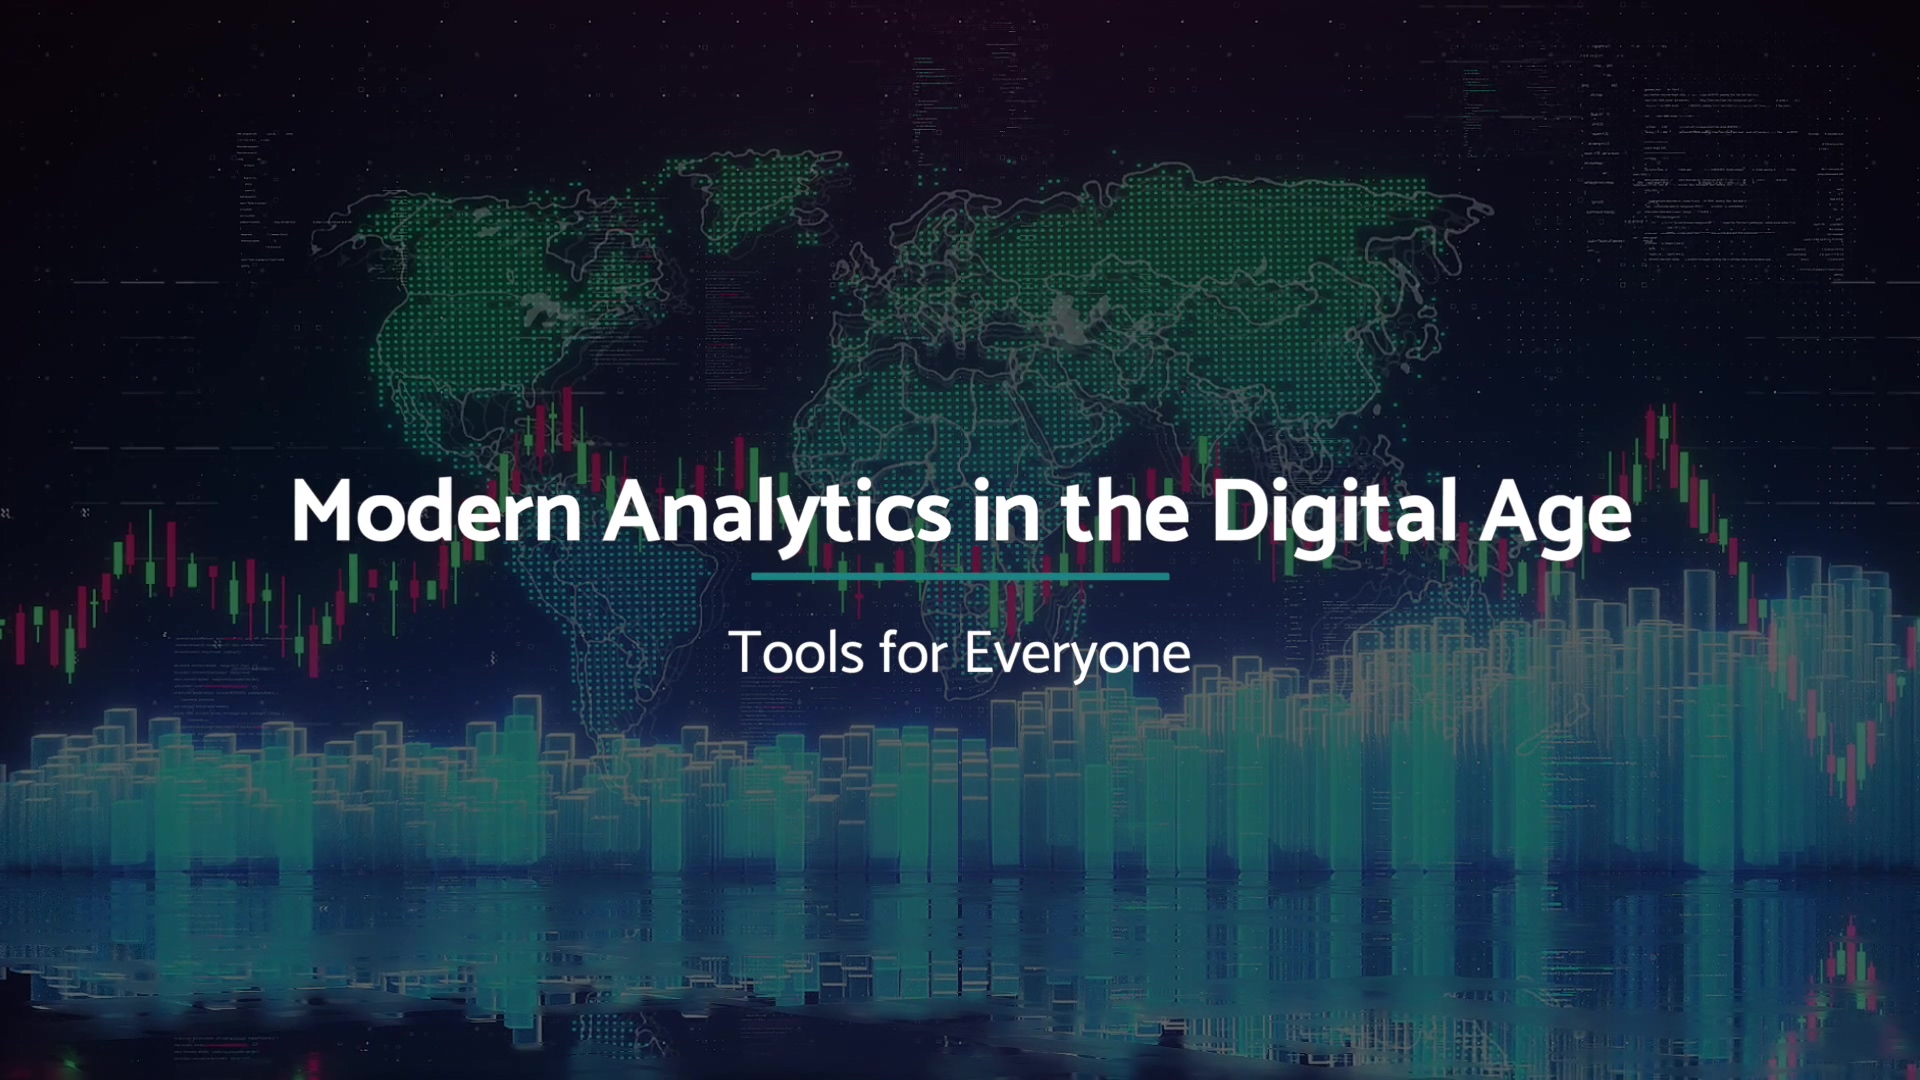 Ventana_Research_VentanaCast_Modern_Analytics_in_the_Digital_Age